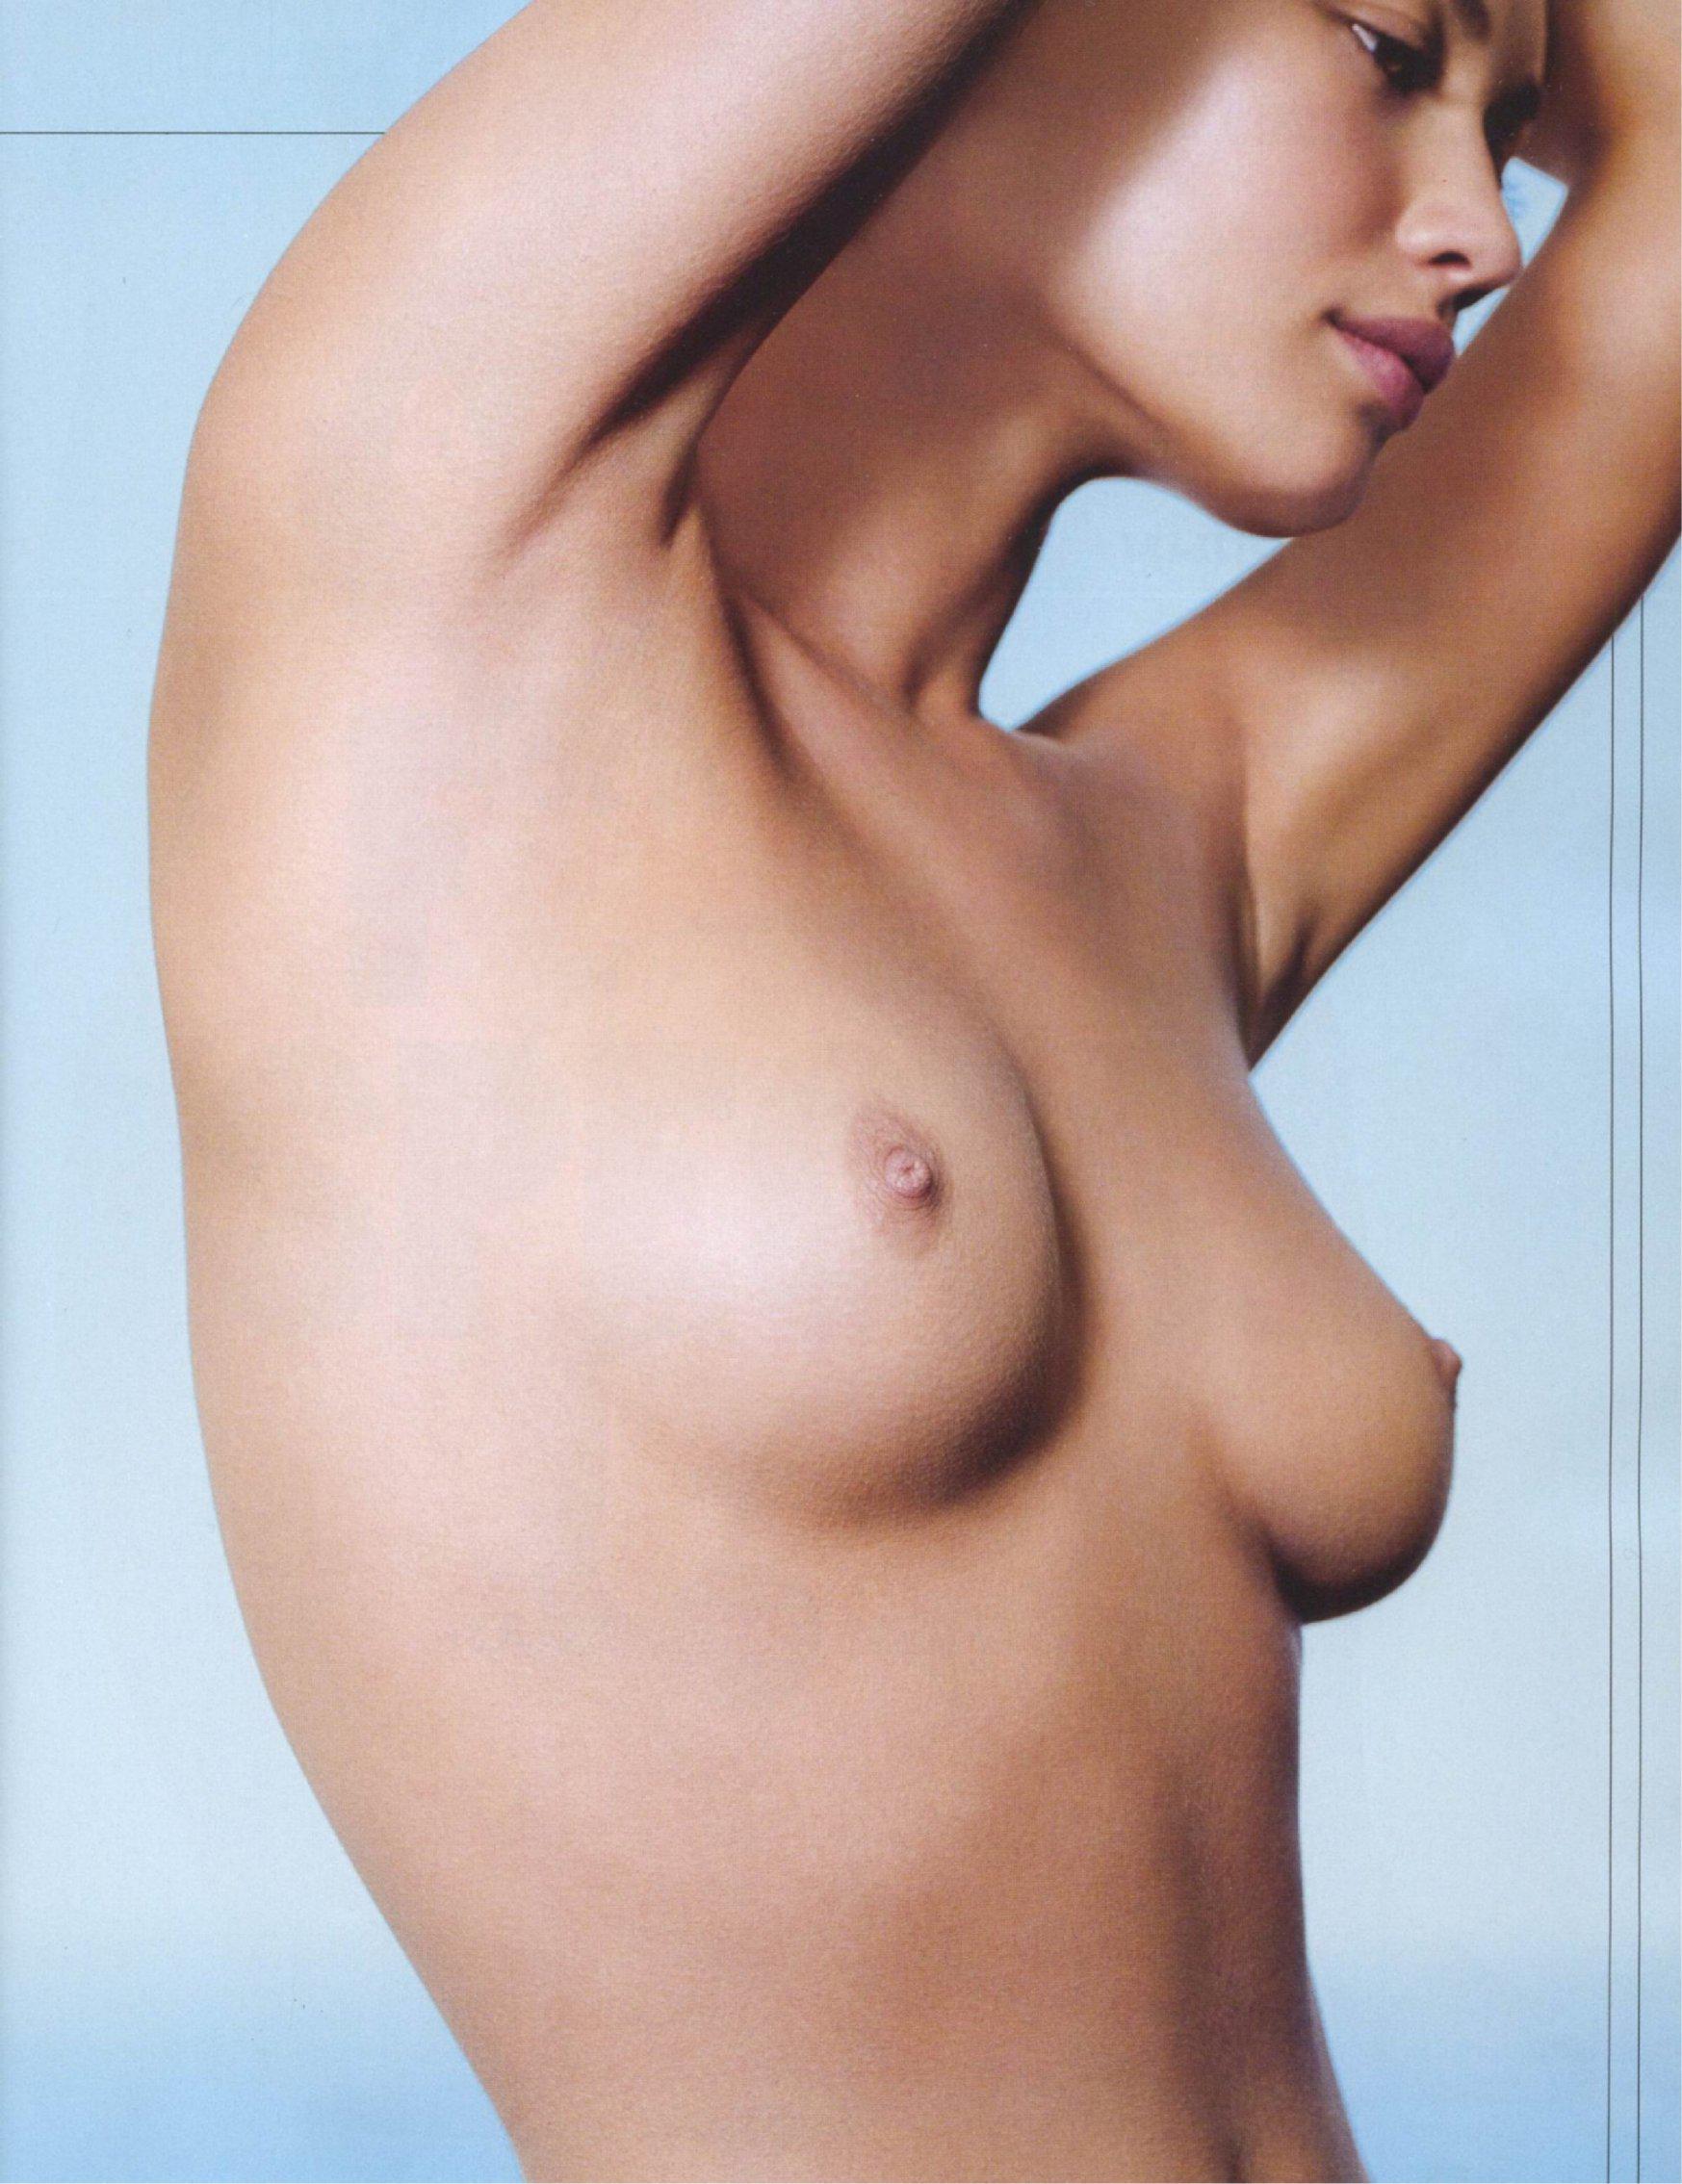 fotos Olga Kurylenko desnuda 1